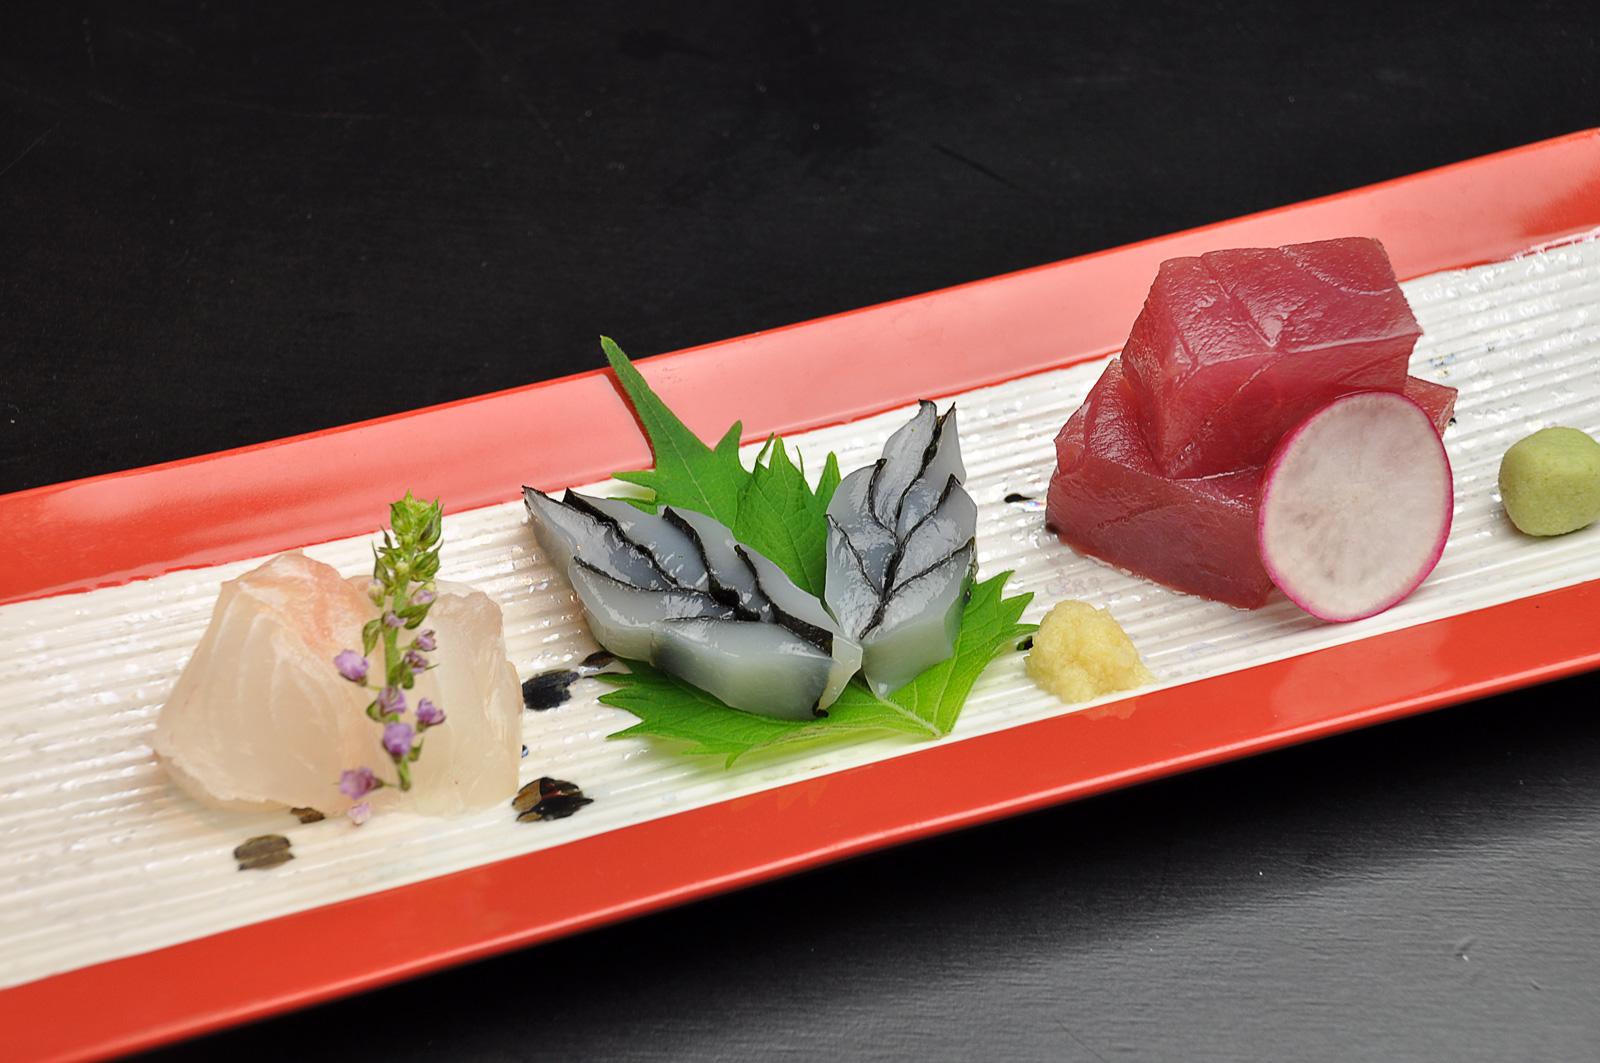 http://www.chikurinbou.com/news/topics/images/1909kaiseki585.jpg